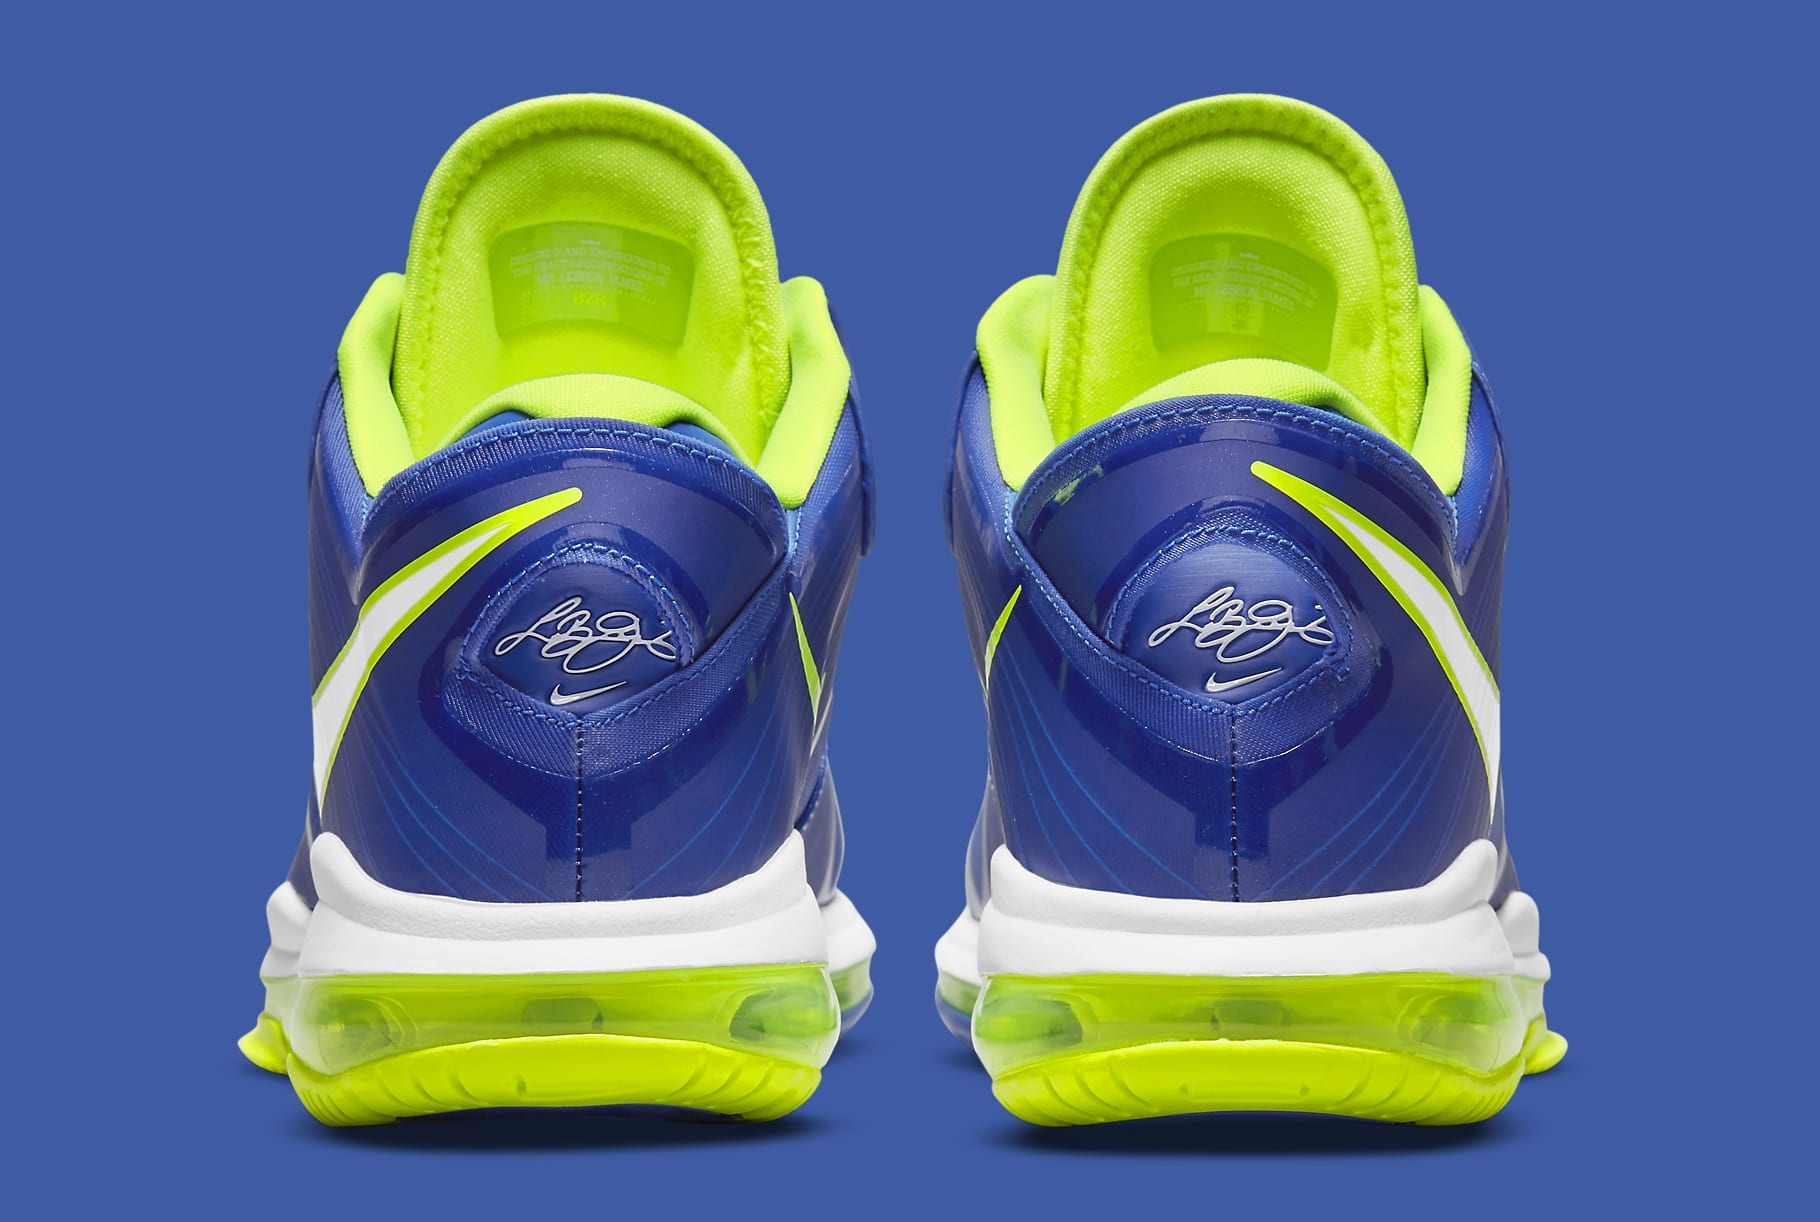 Nike LeBron 8 Low 'Sprite' 2021 DN1581-400 Heel